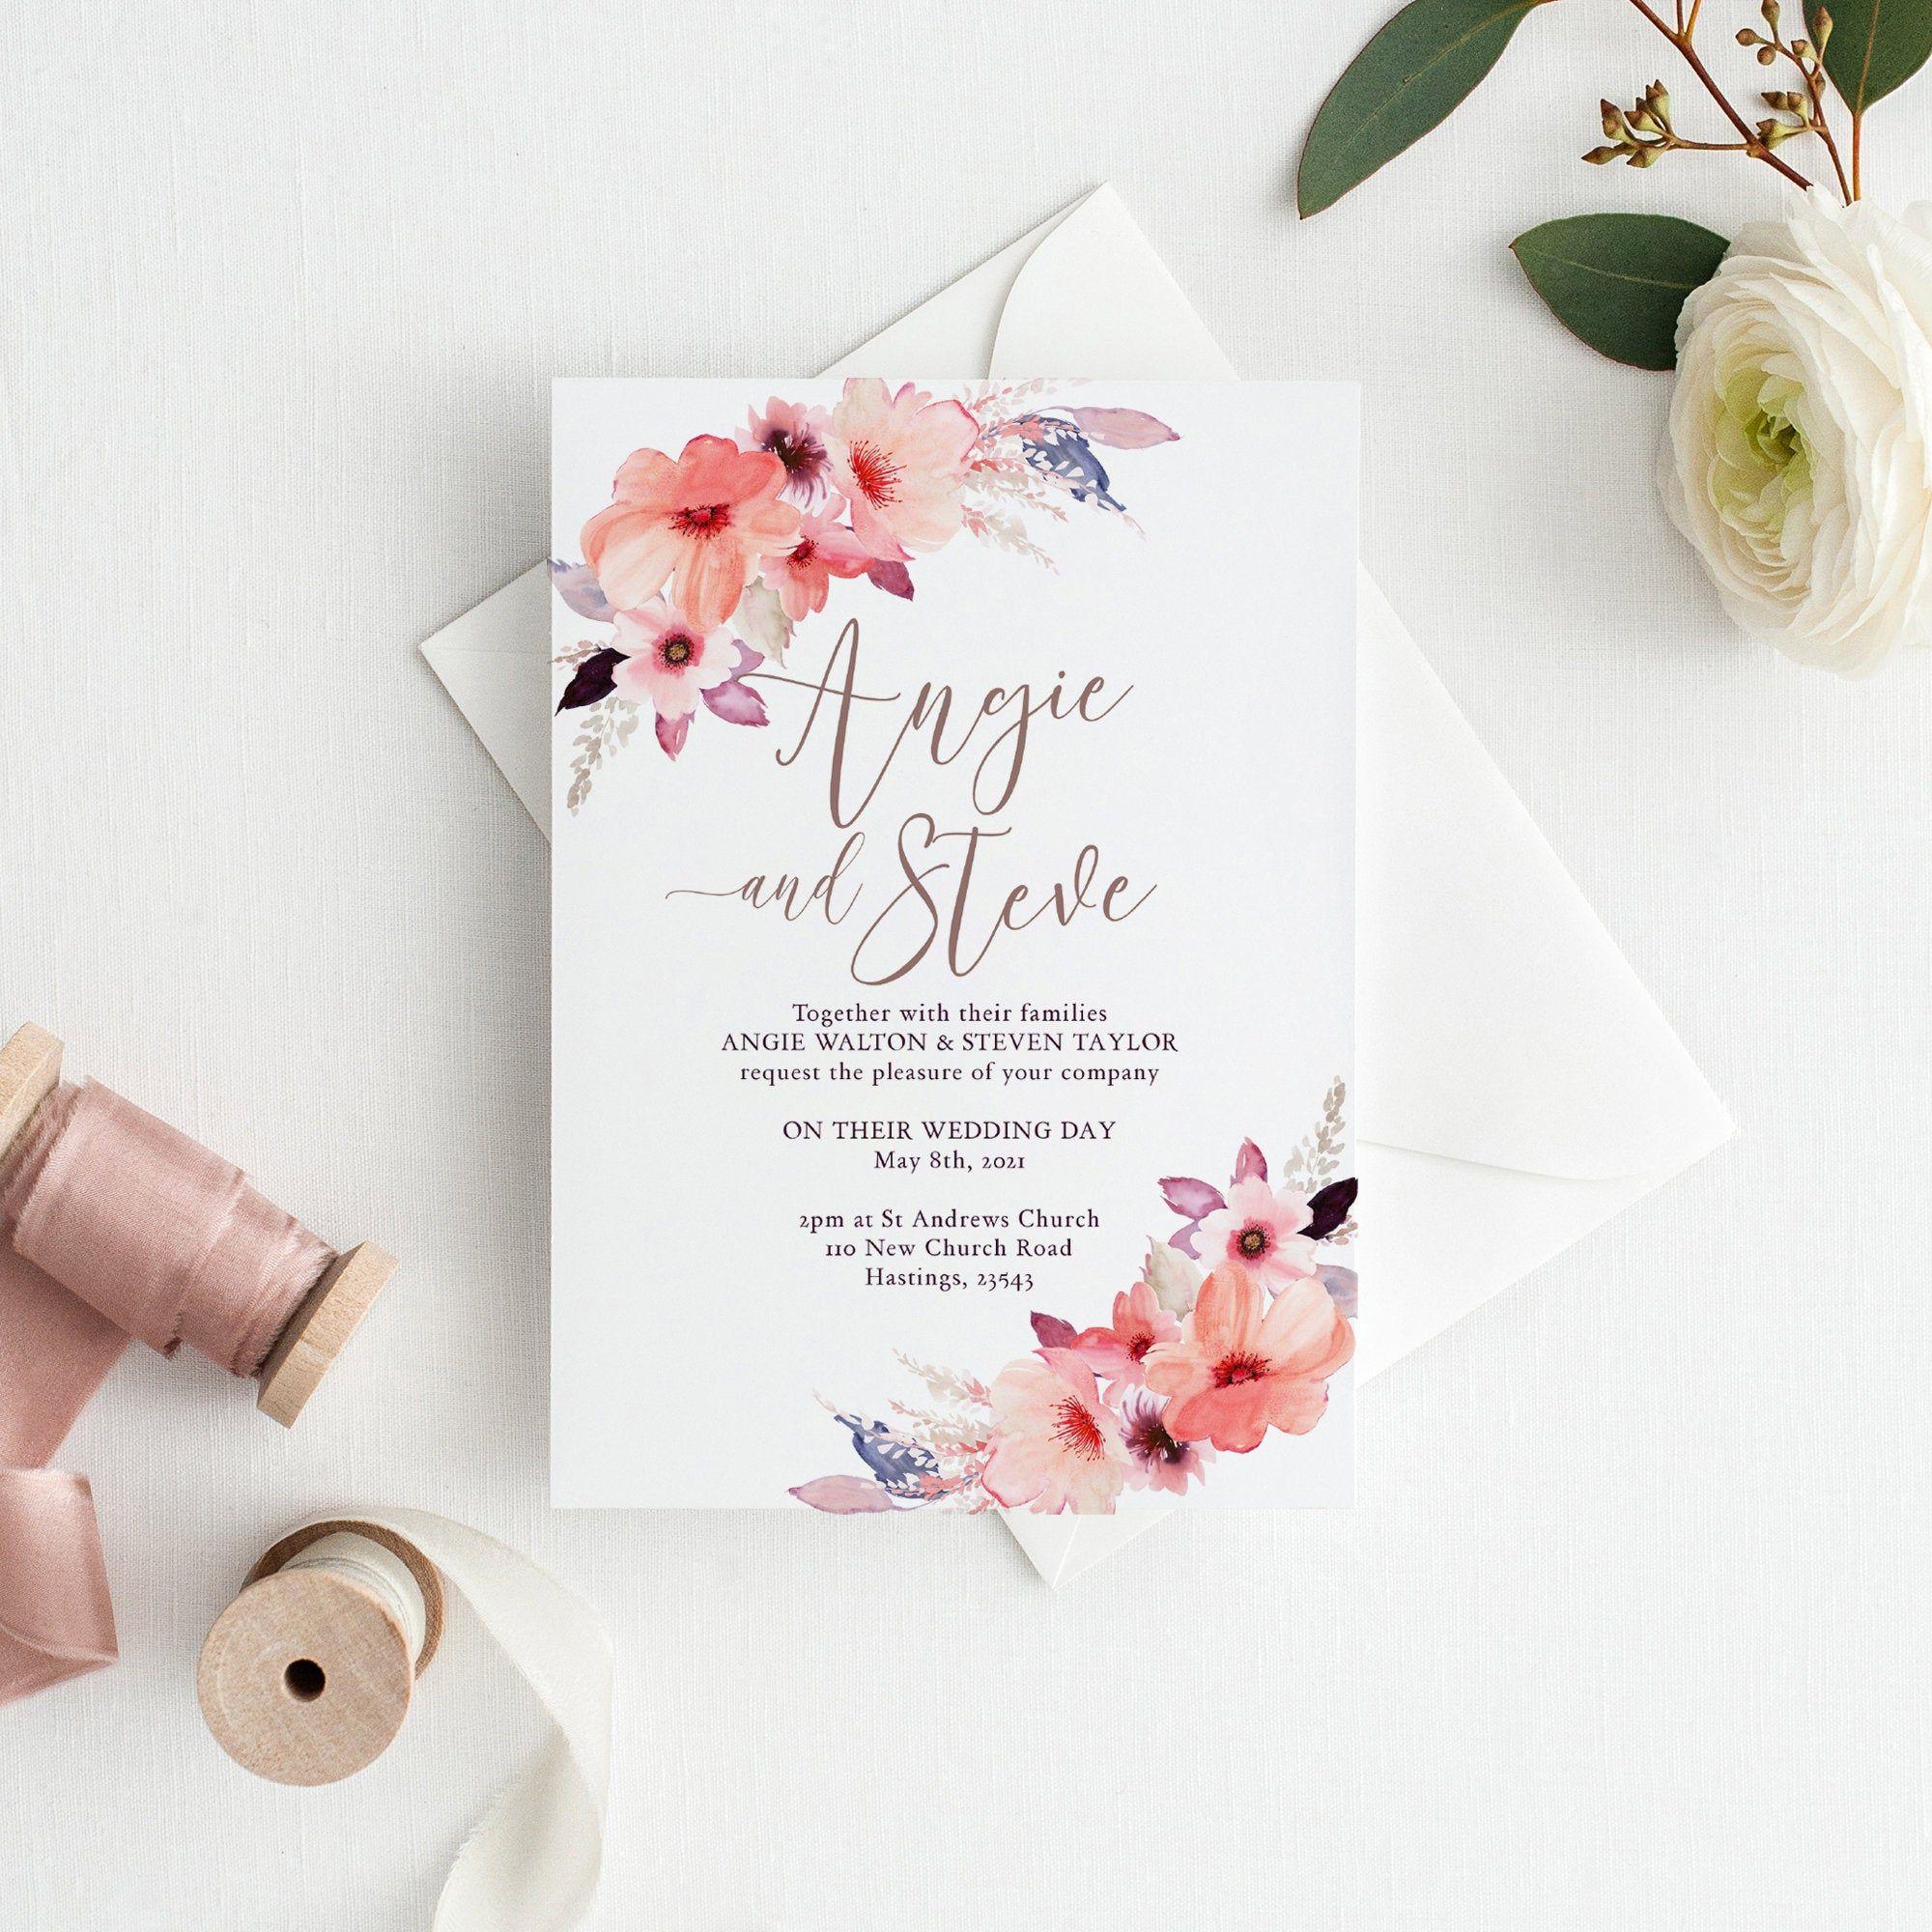 Floral Wedding Invitation Template Printable Invitation With Etsy Wedding Invitation Templates Floral Wedding Invitations Wedding Invitations